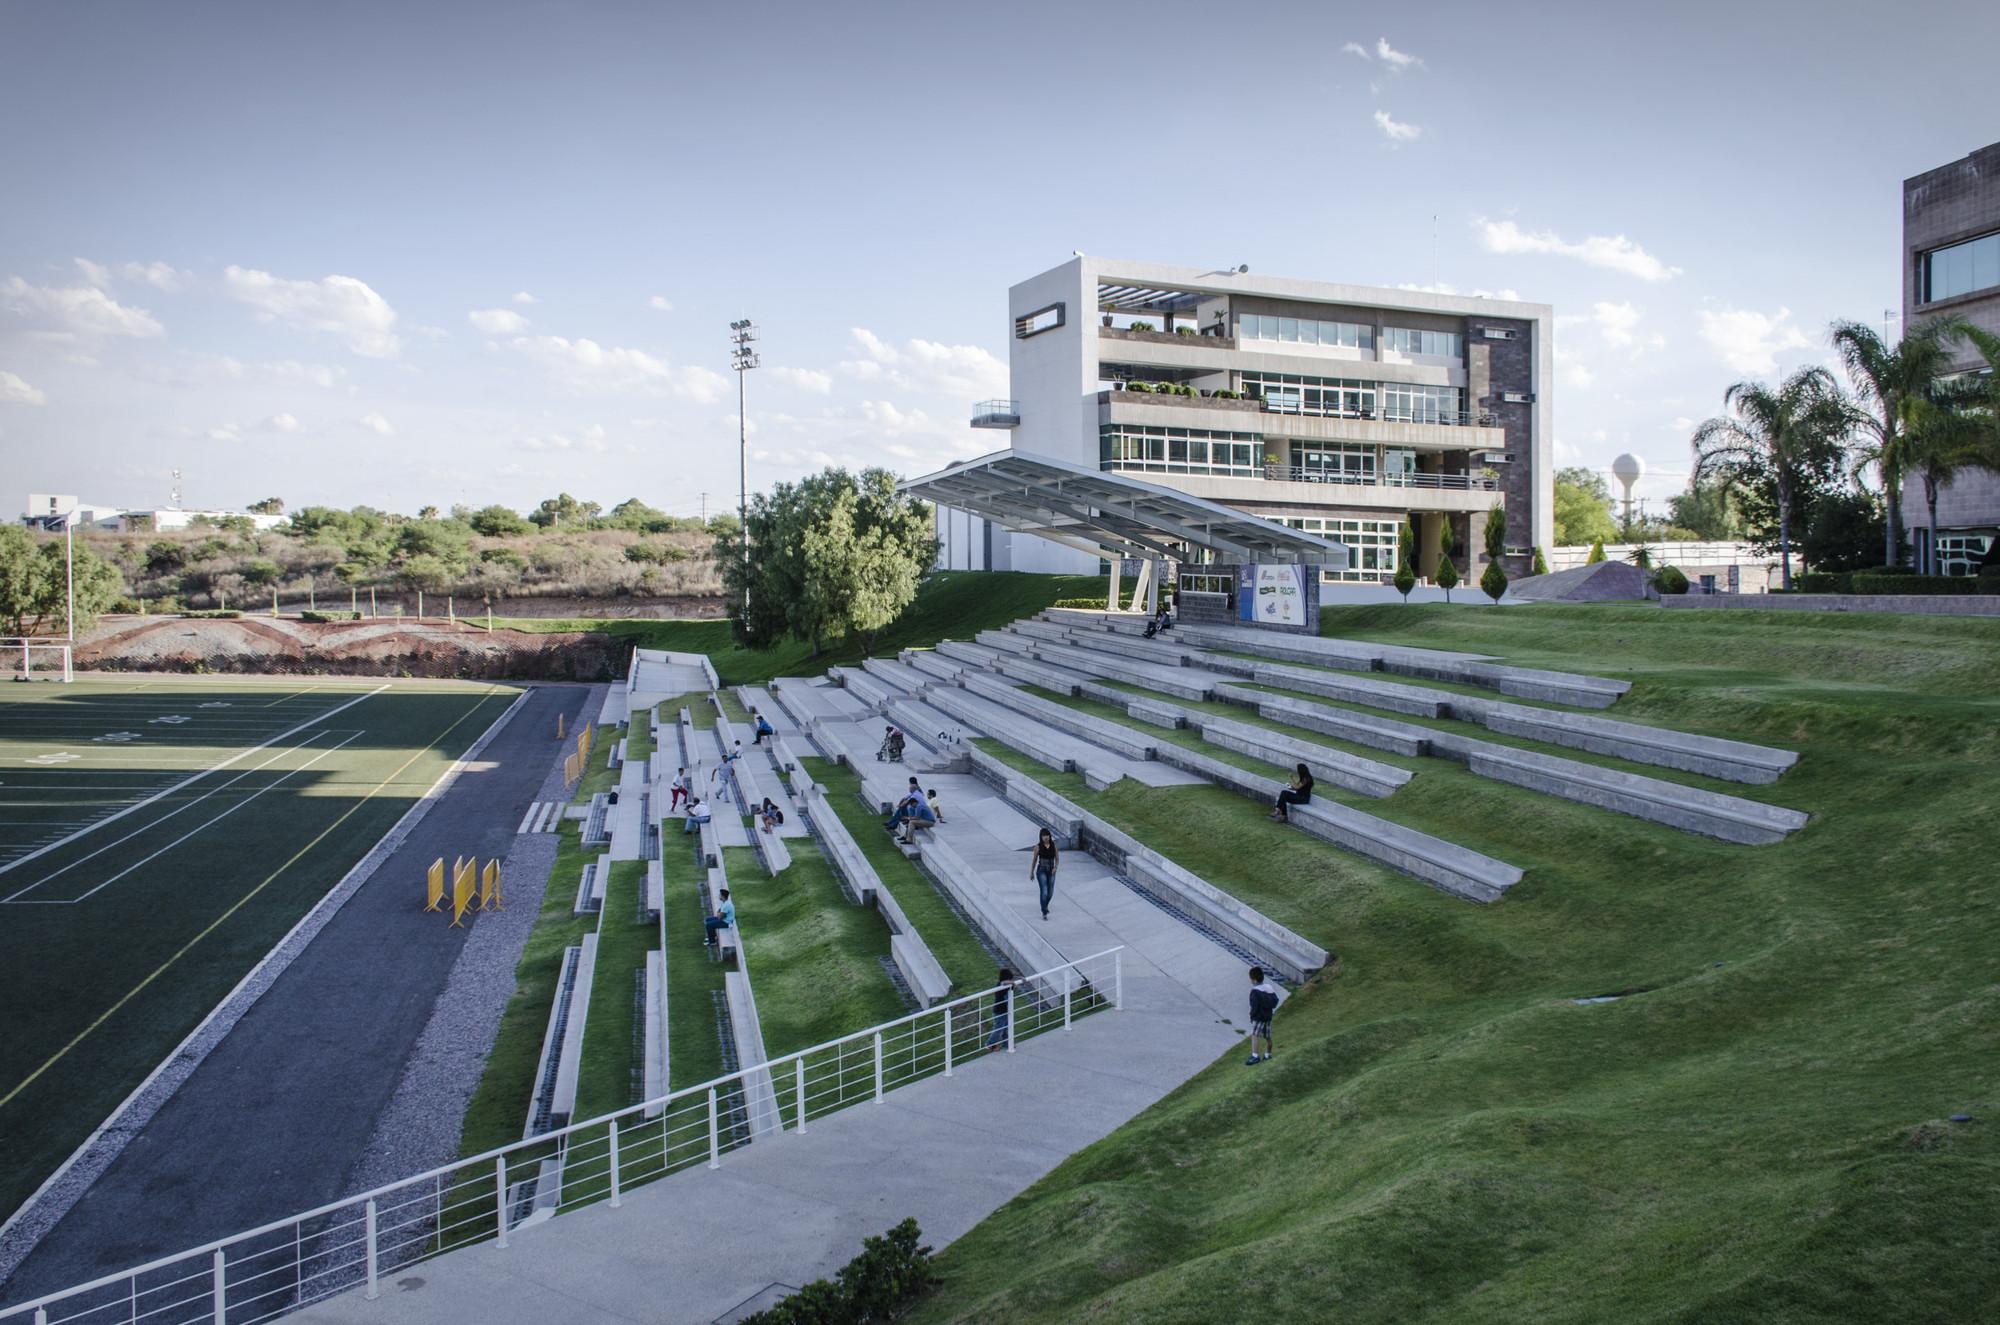 Borregos Stadium / Arkylab + Mauricio Ruiz, © Oscar Hernandez